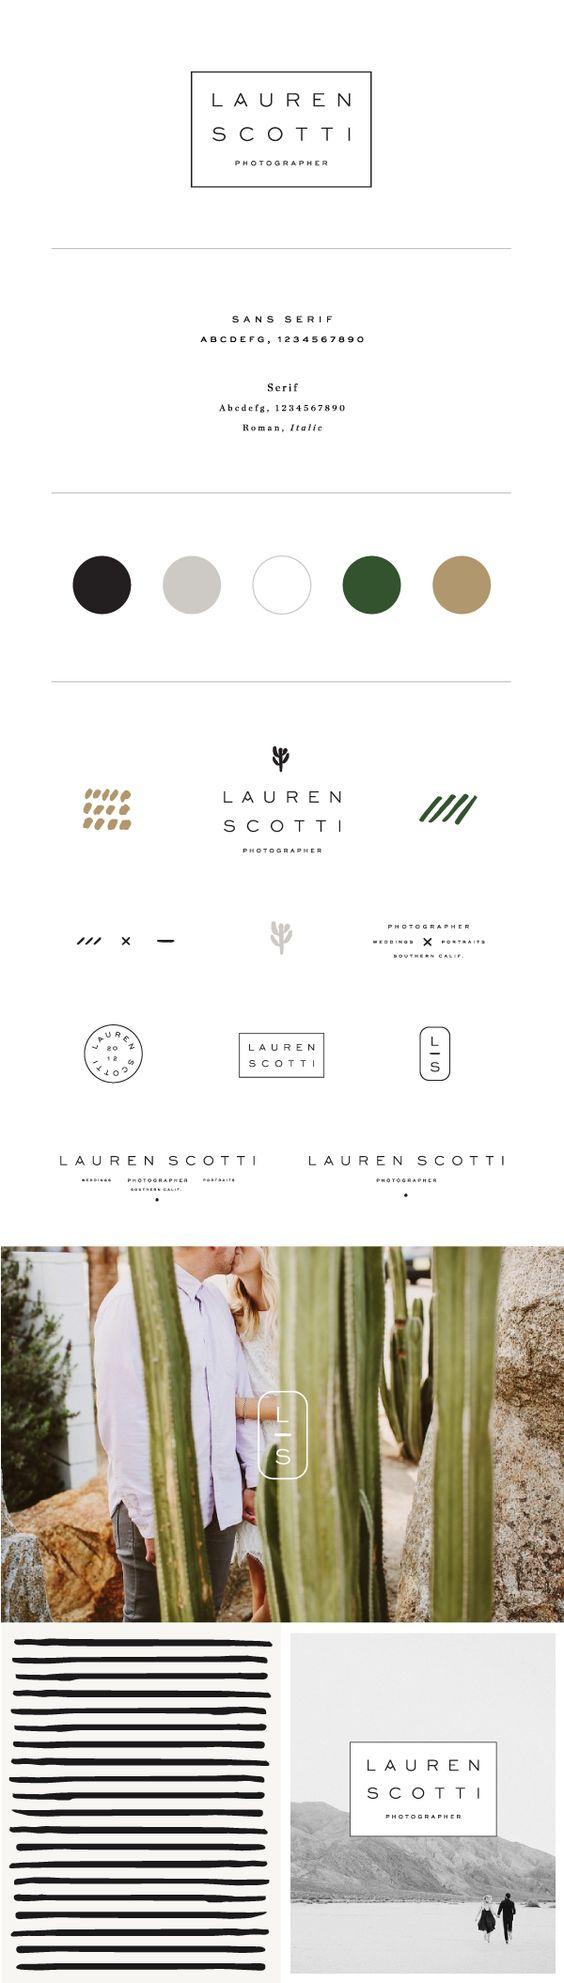 Brand Identity for Lauren Scotti Photographer by Saturday Studio